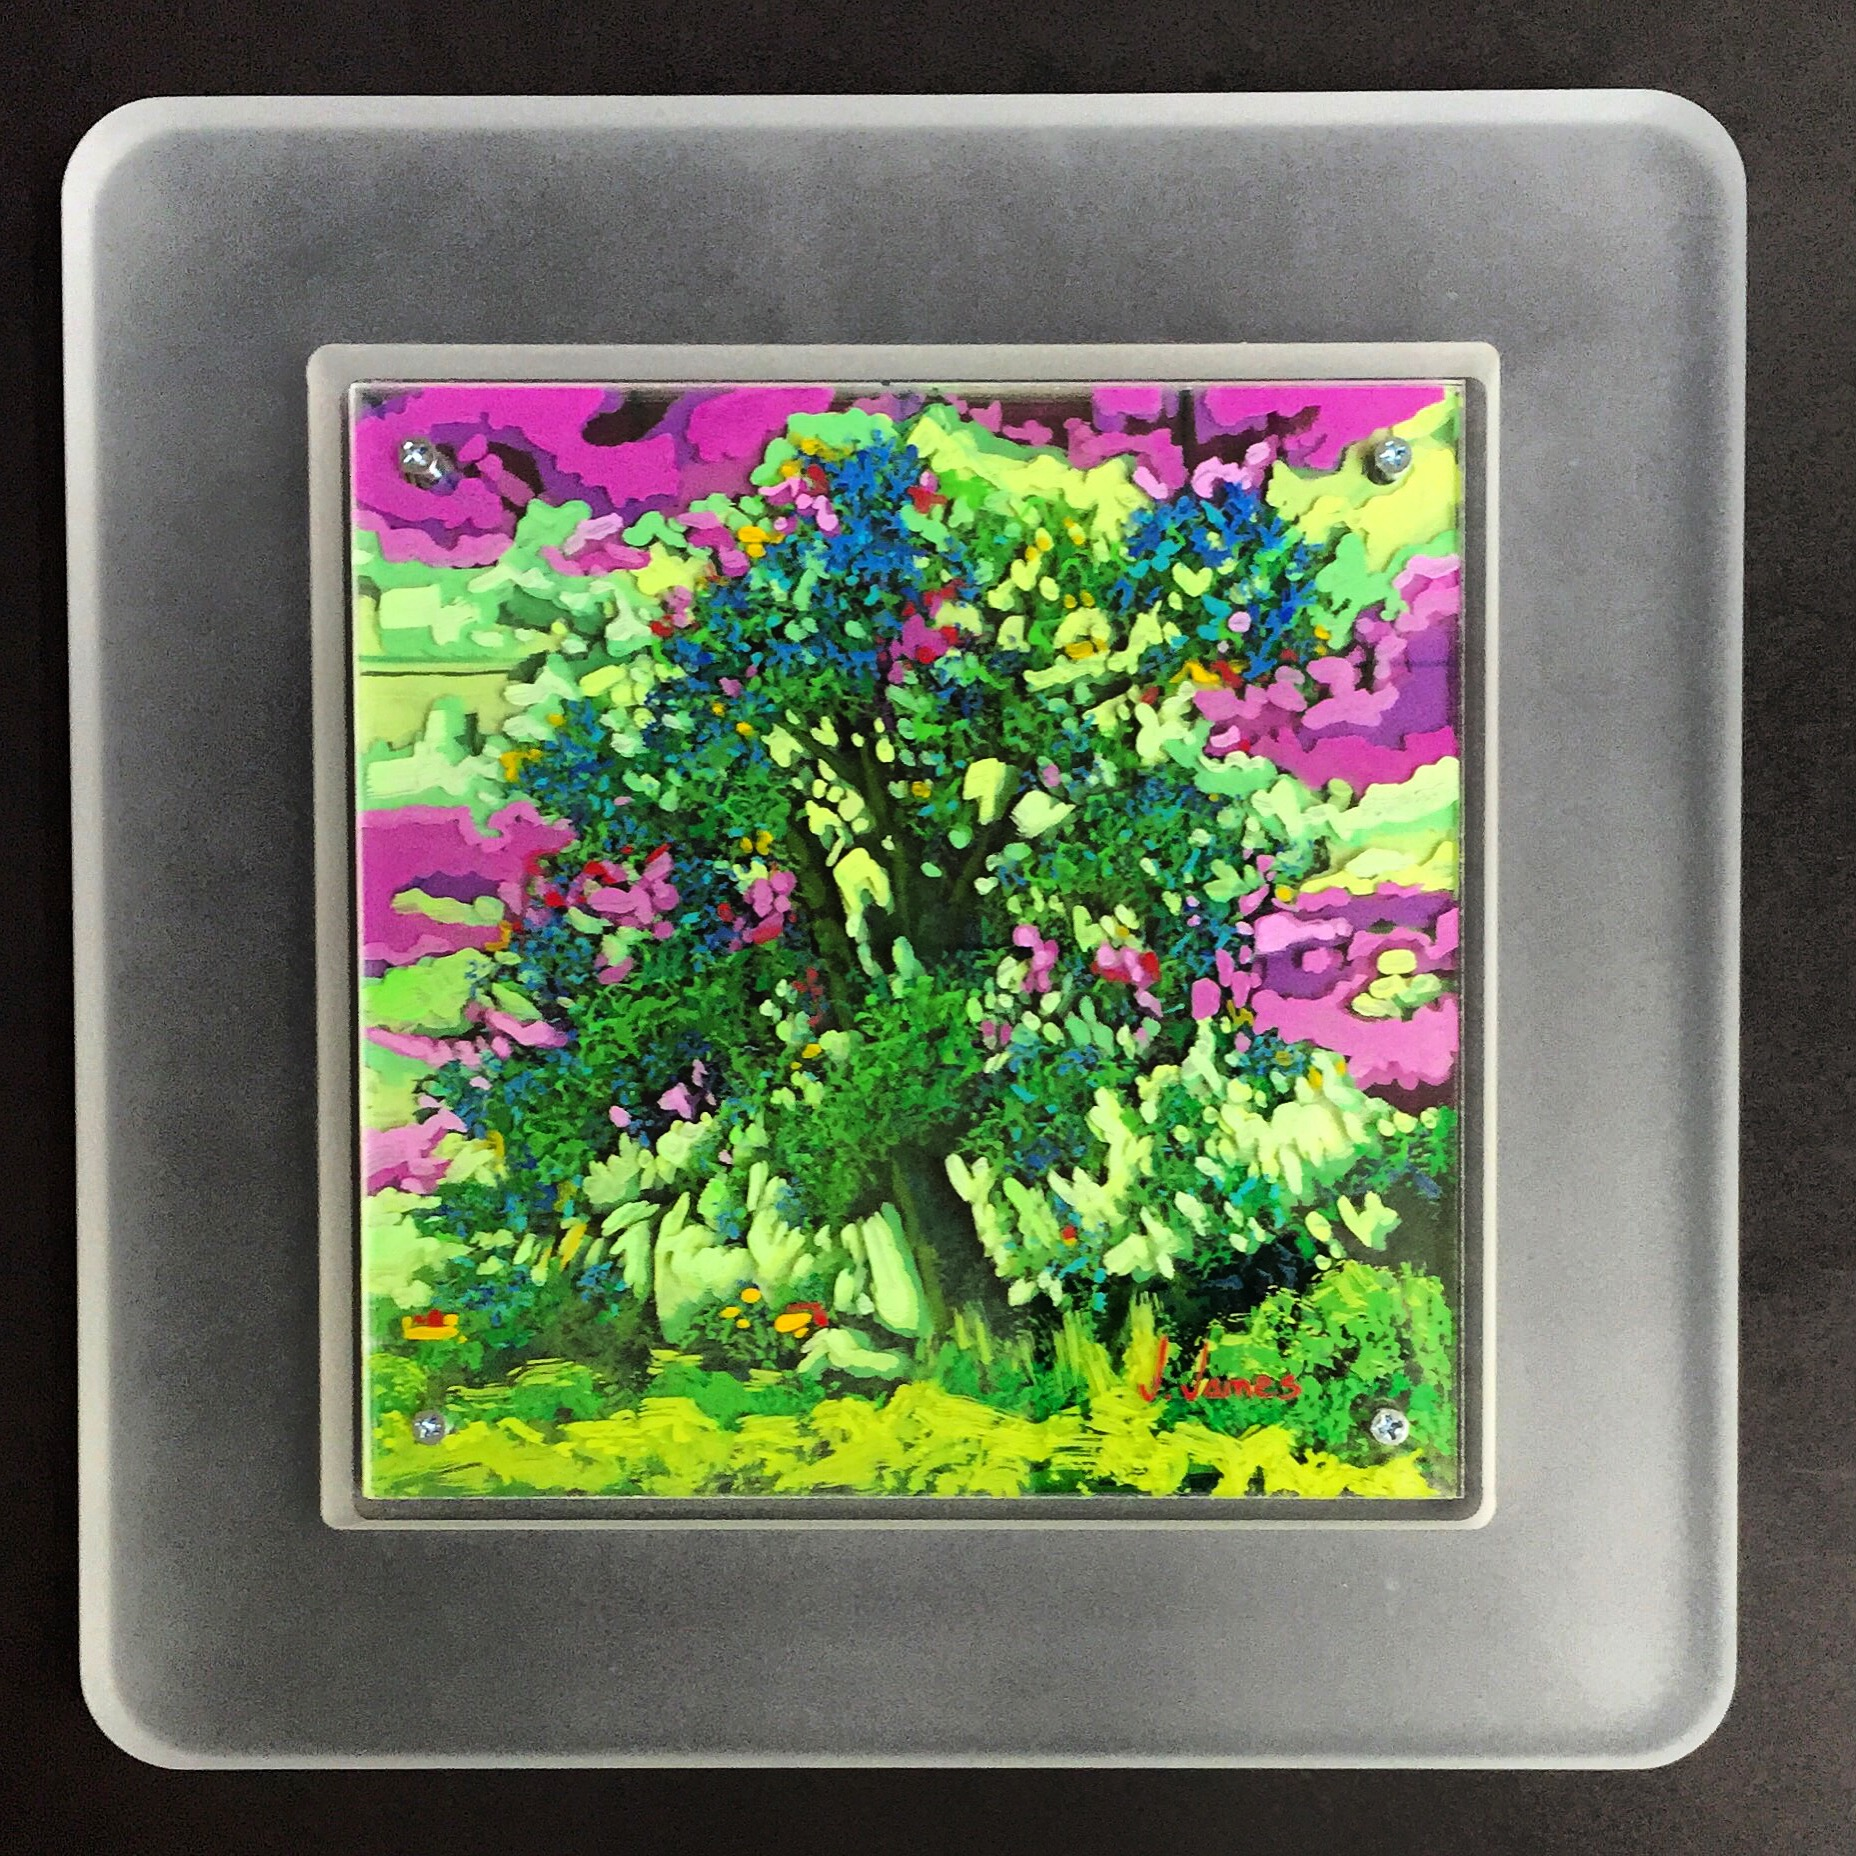 "Tequila Lime, 8"" x 8"" Acrylic on Multi-Layered Acrylic Glass"